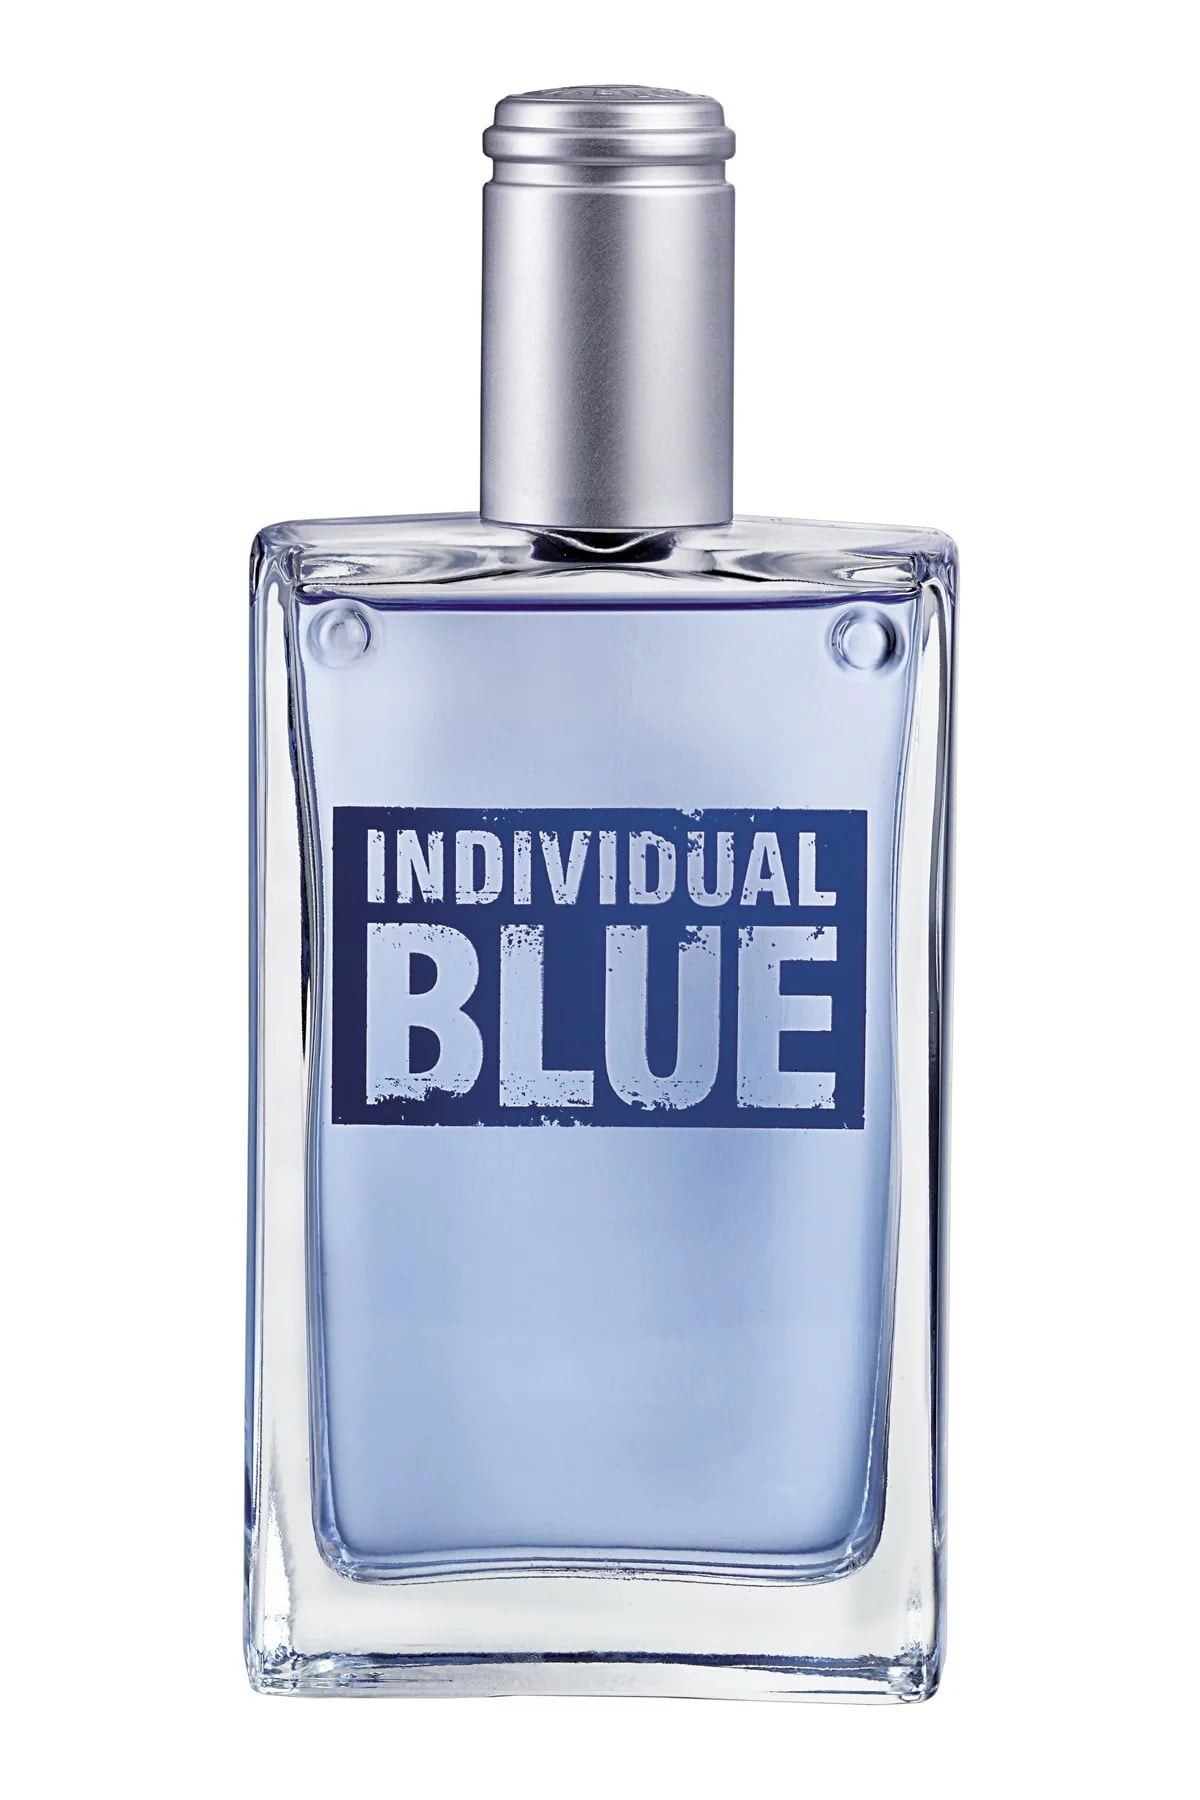 AVON Individual Blue Edt 100 ml Erkek Parfümü ELİTKOZMETİK000356 1